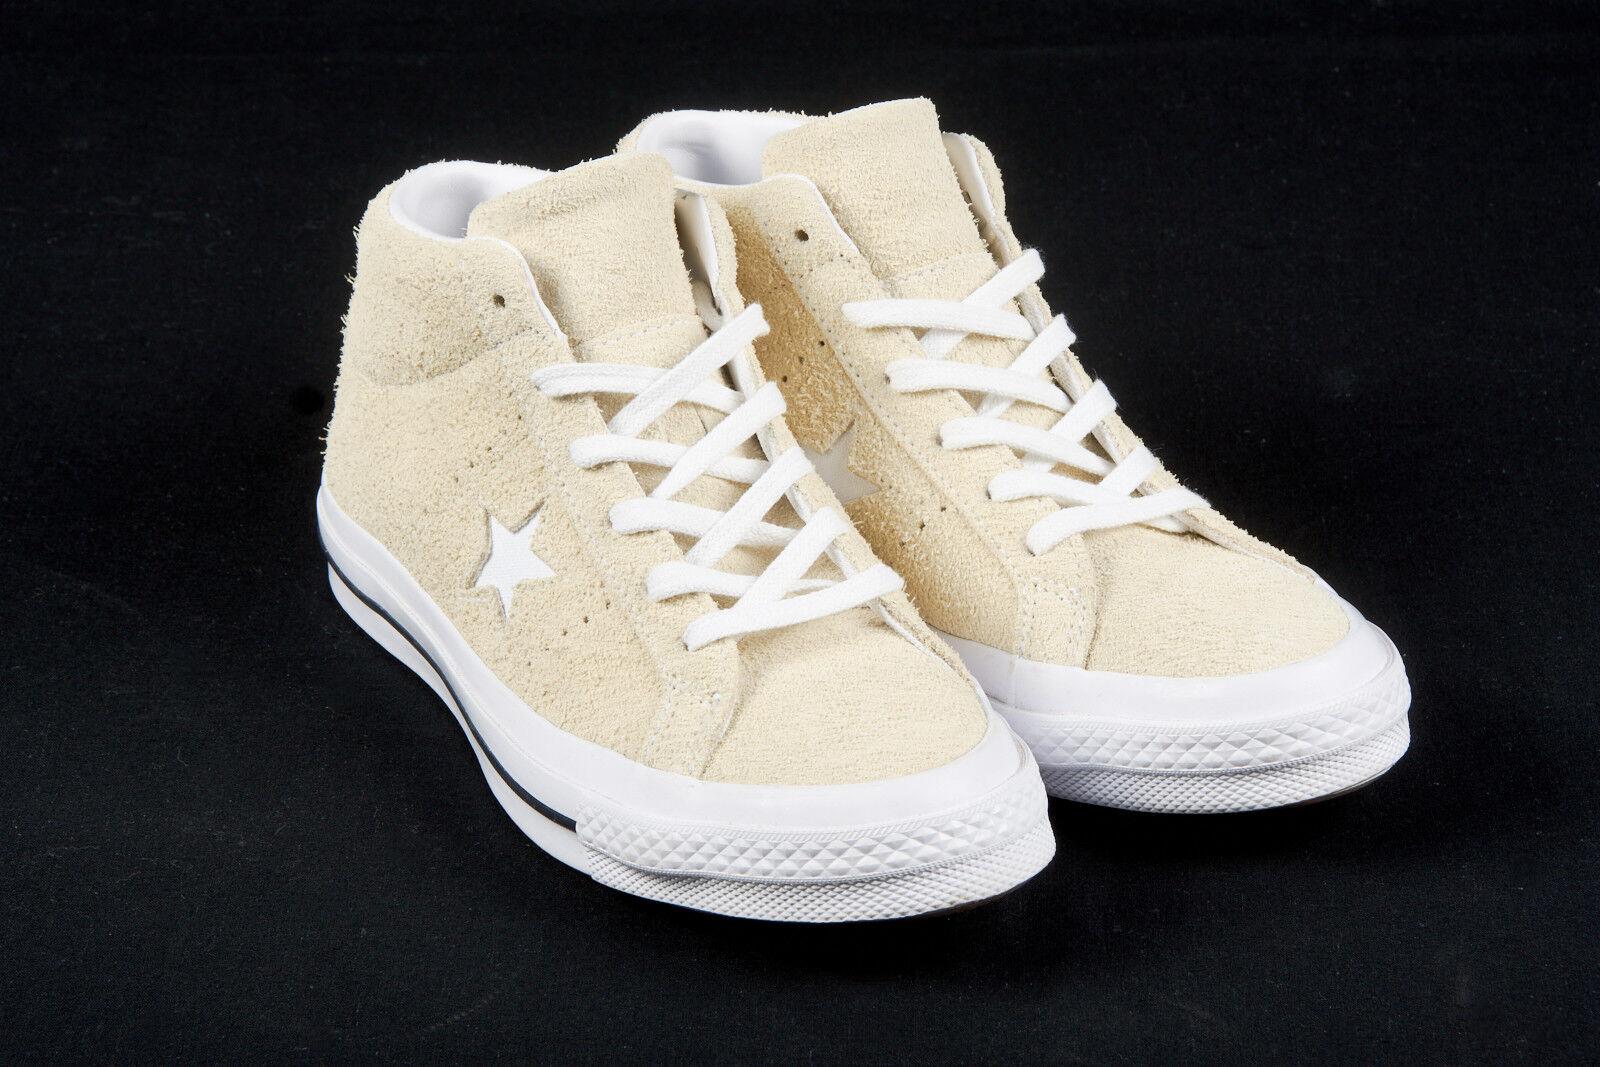 Damen Converse' ein Stern 'Schuhe 8 in Dampf Zitrone Zitrone Zitrone 159594C Chuck Taylor 2b2bb6